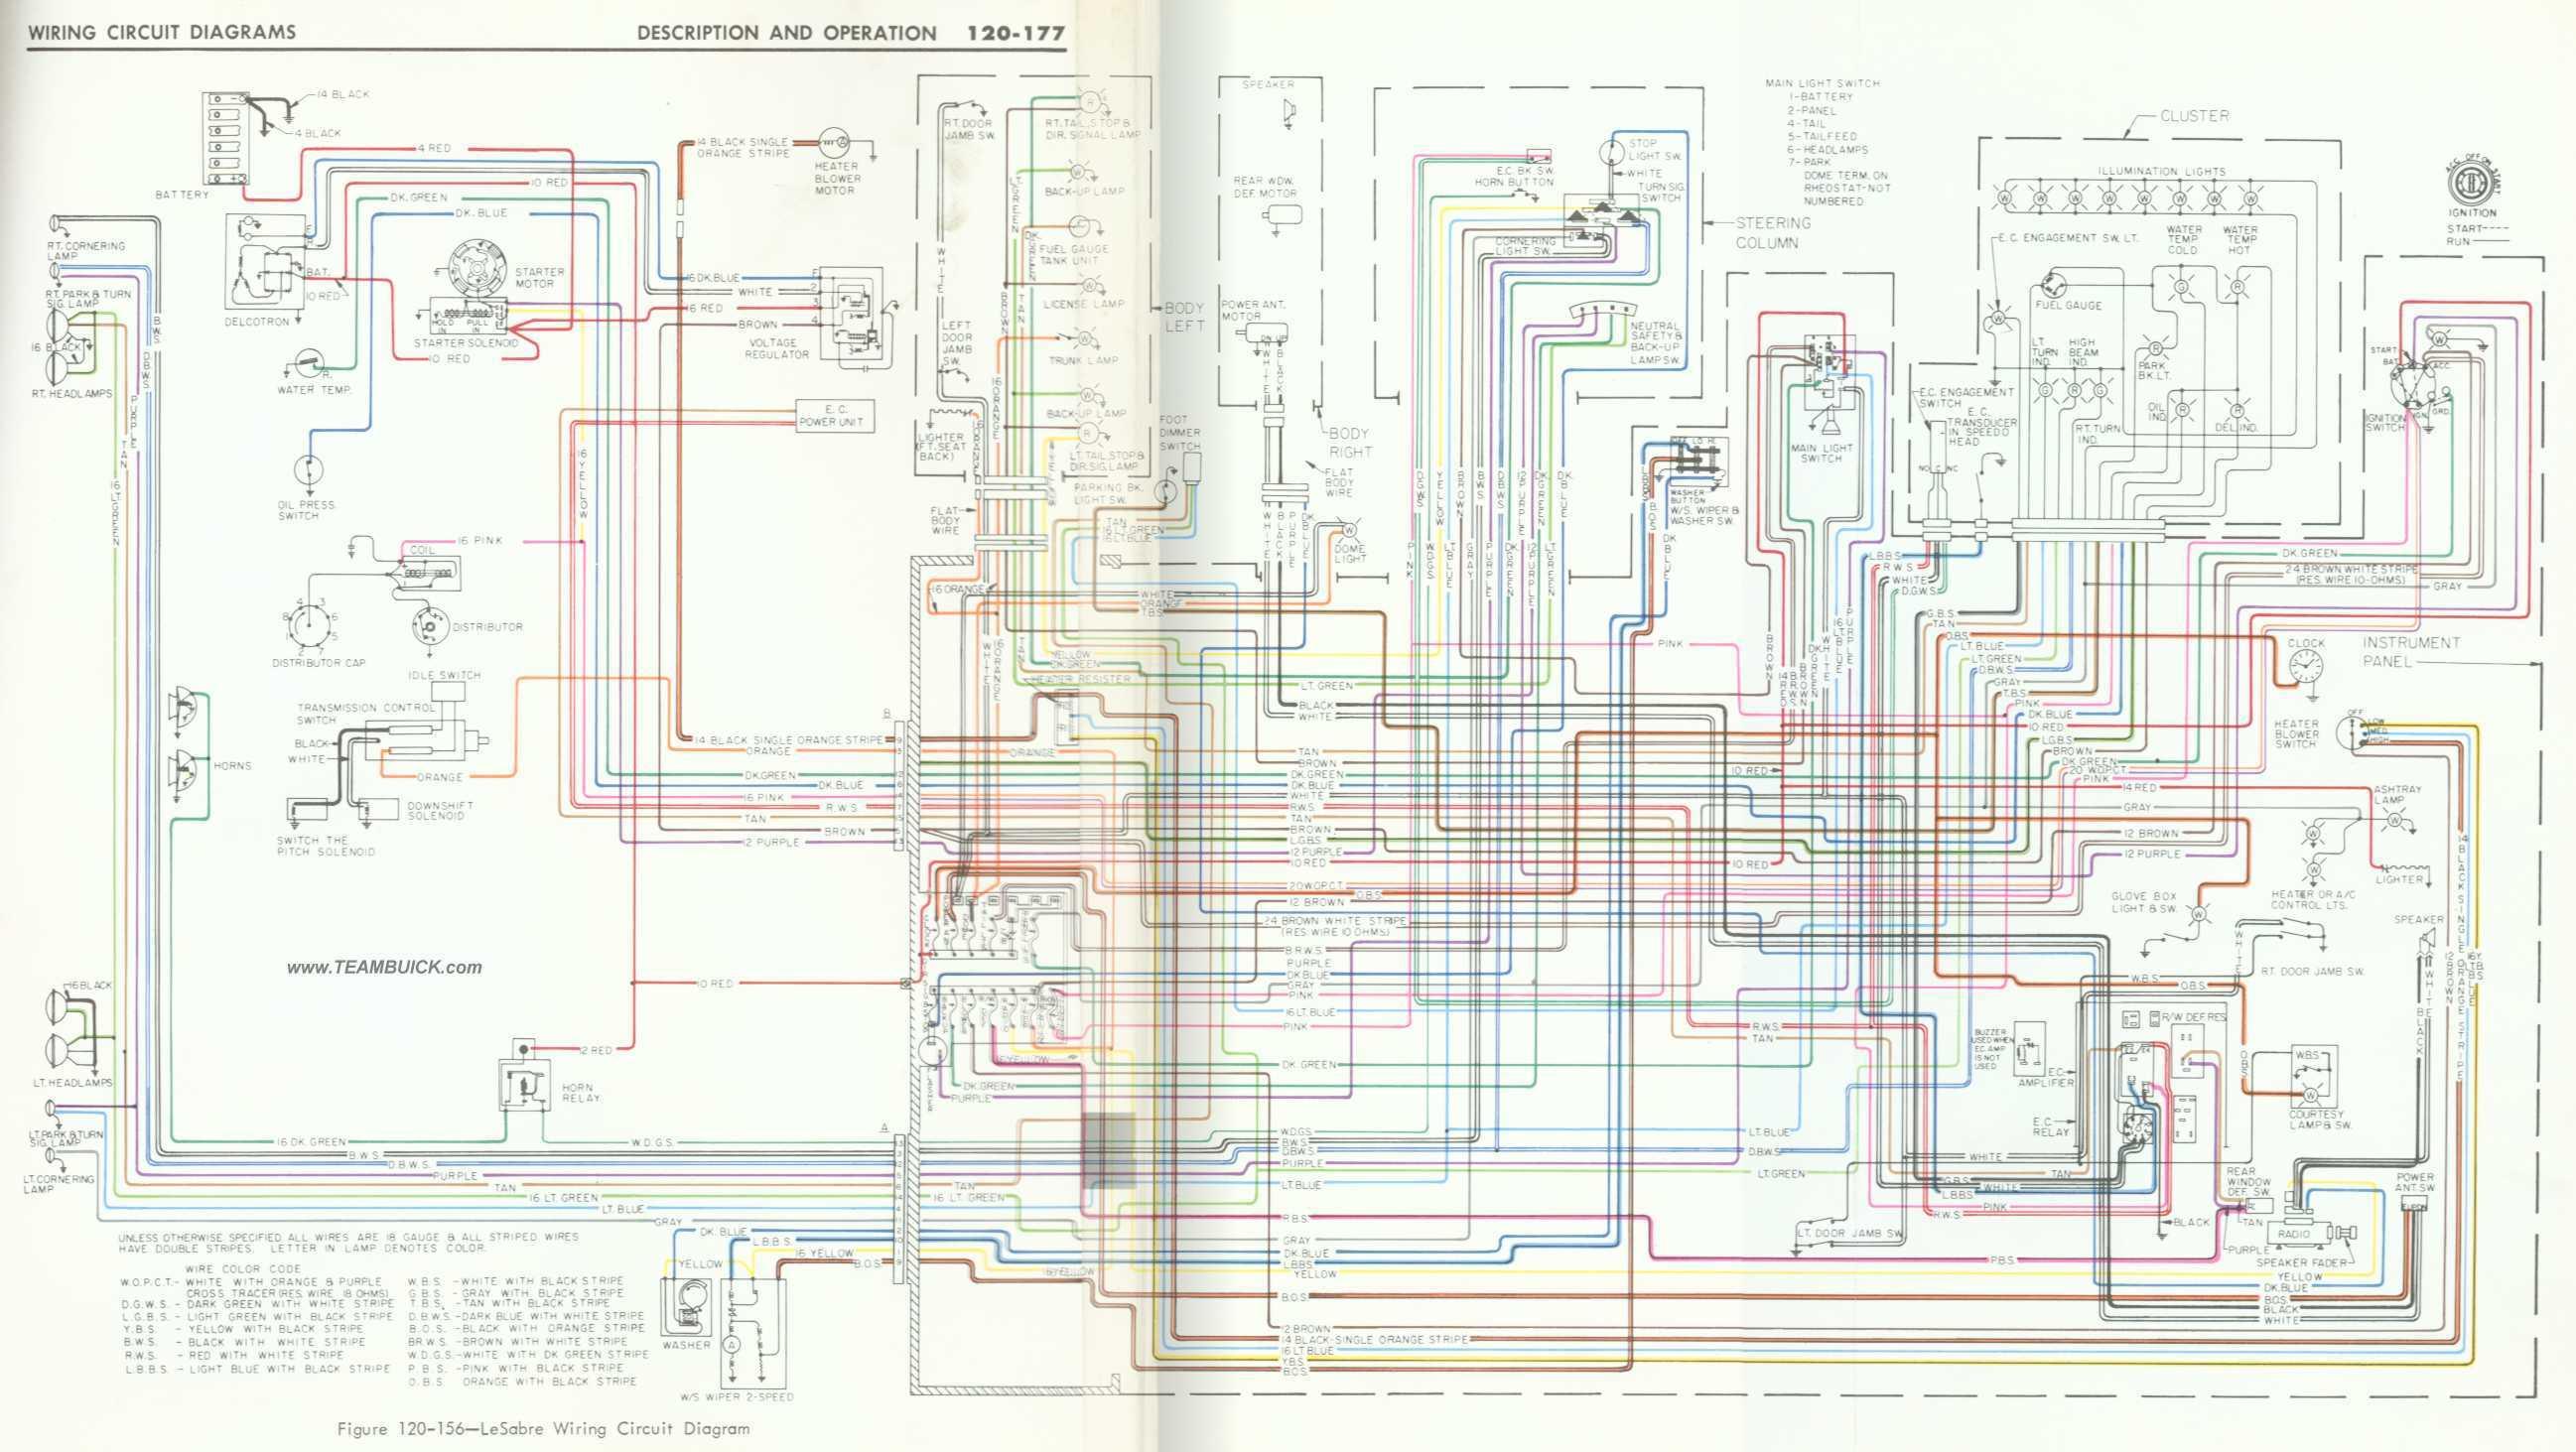 1966 Buick Lesabre Wiring Diagram